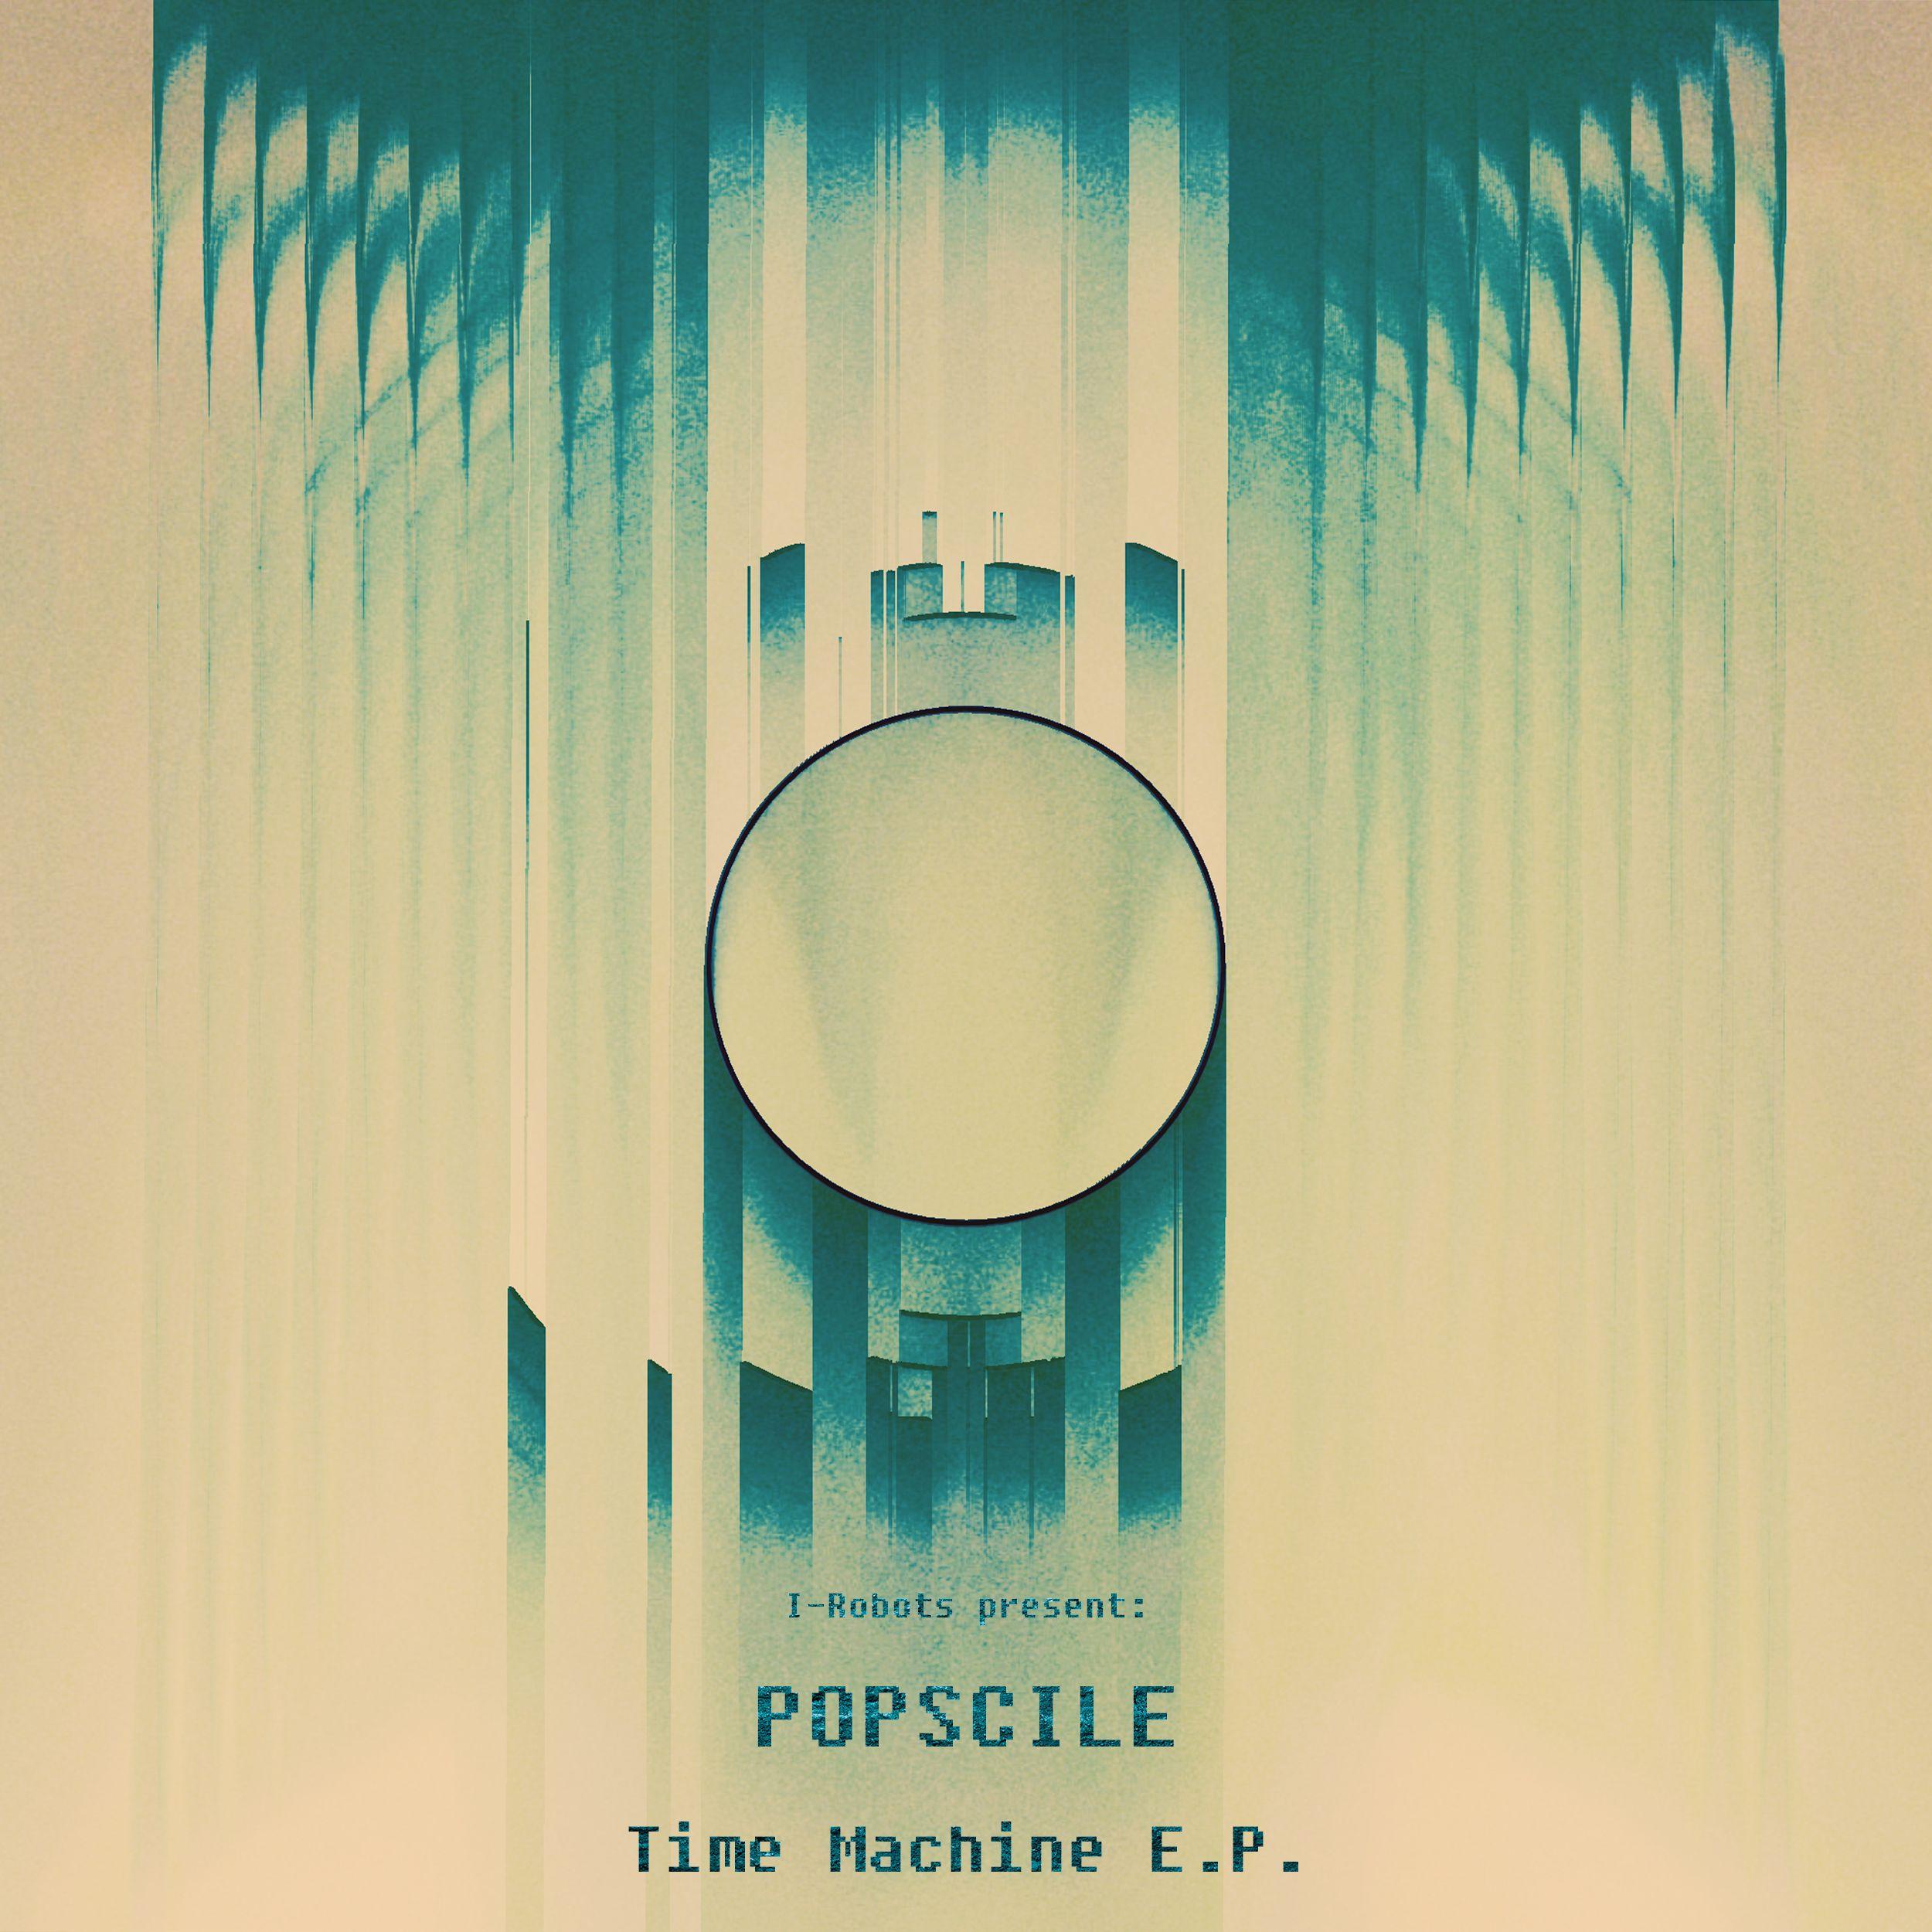 opcm_12_082_i-robots_pres._popscile_-_time_machine_e.p.jpg